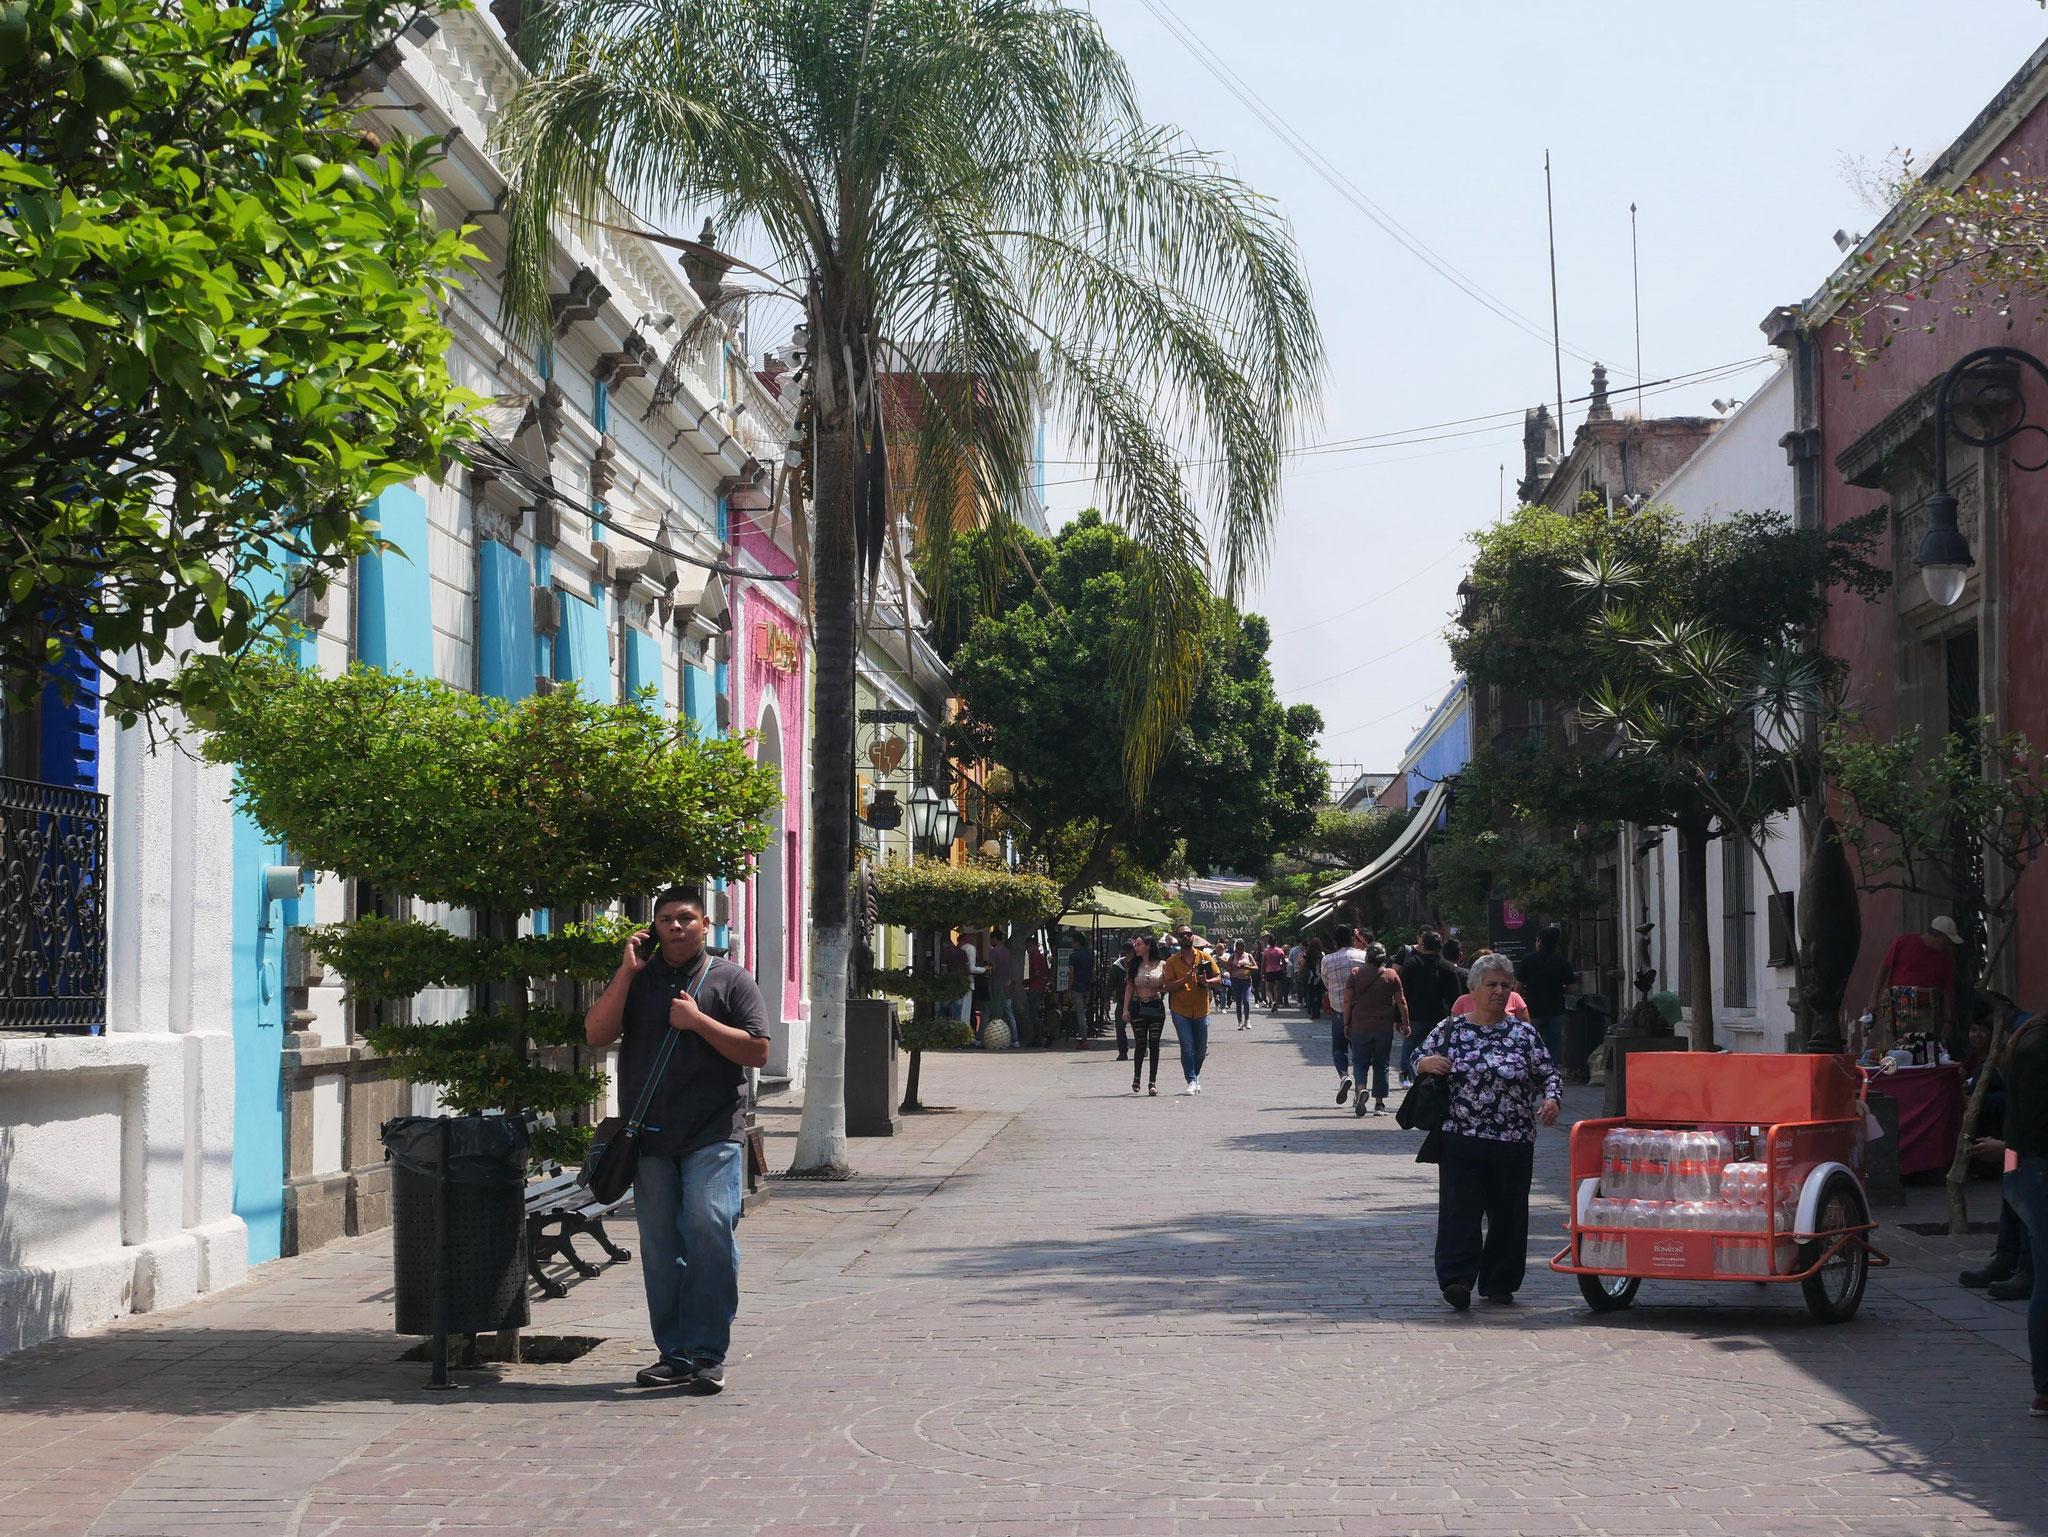 Calle Independencia, Tlaquepaque